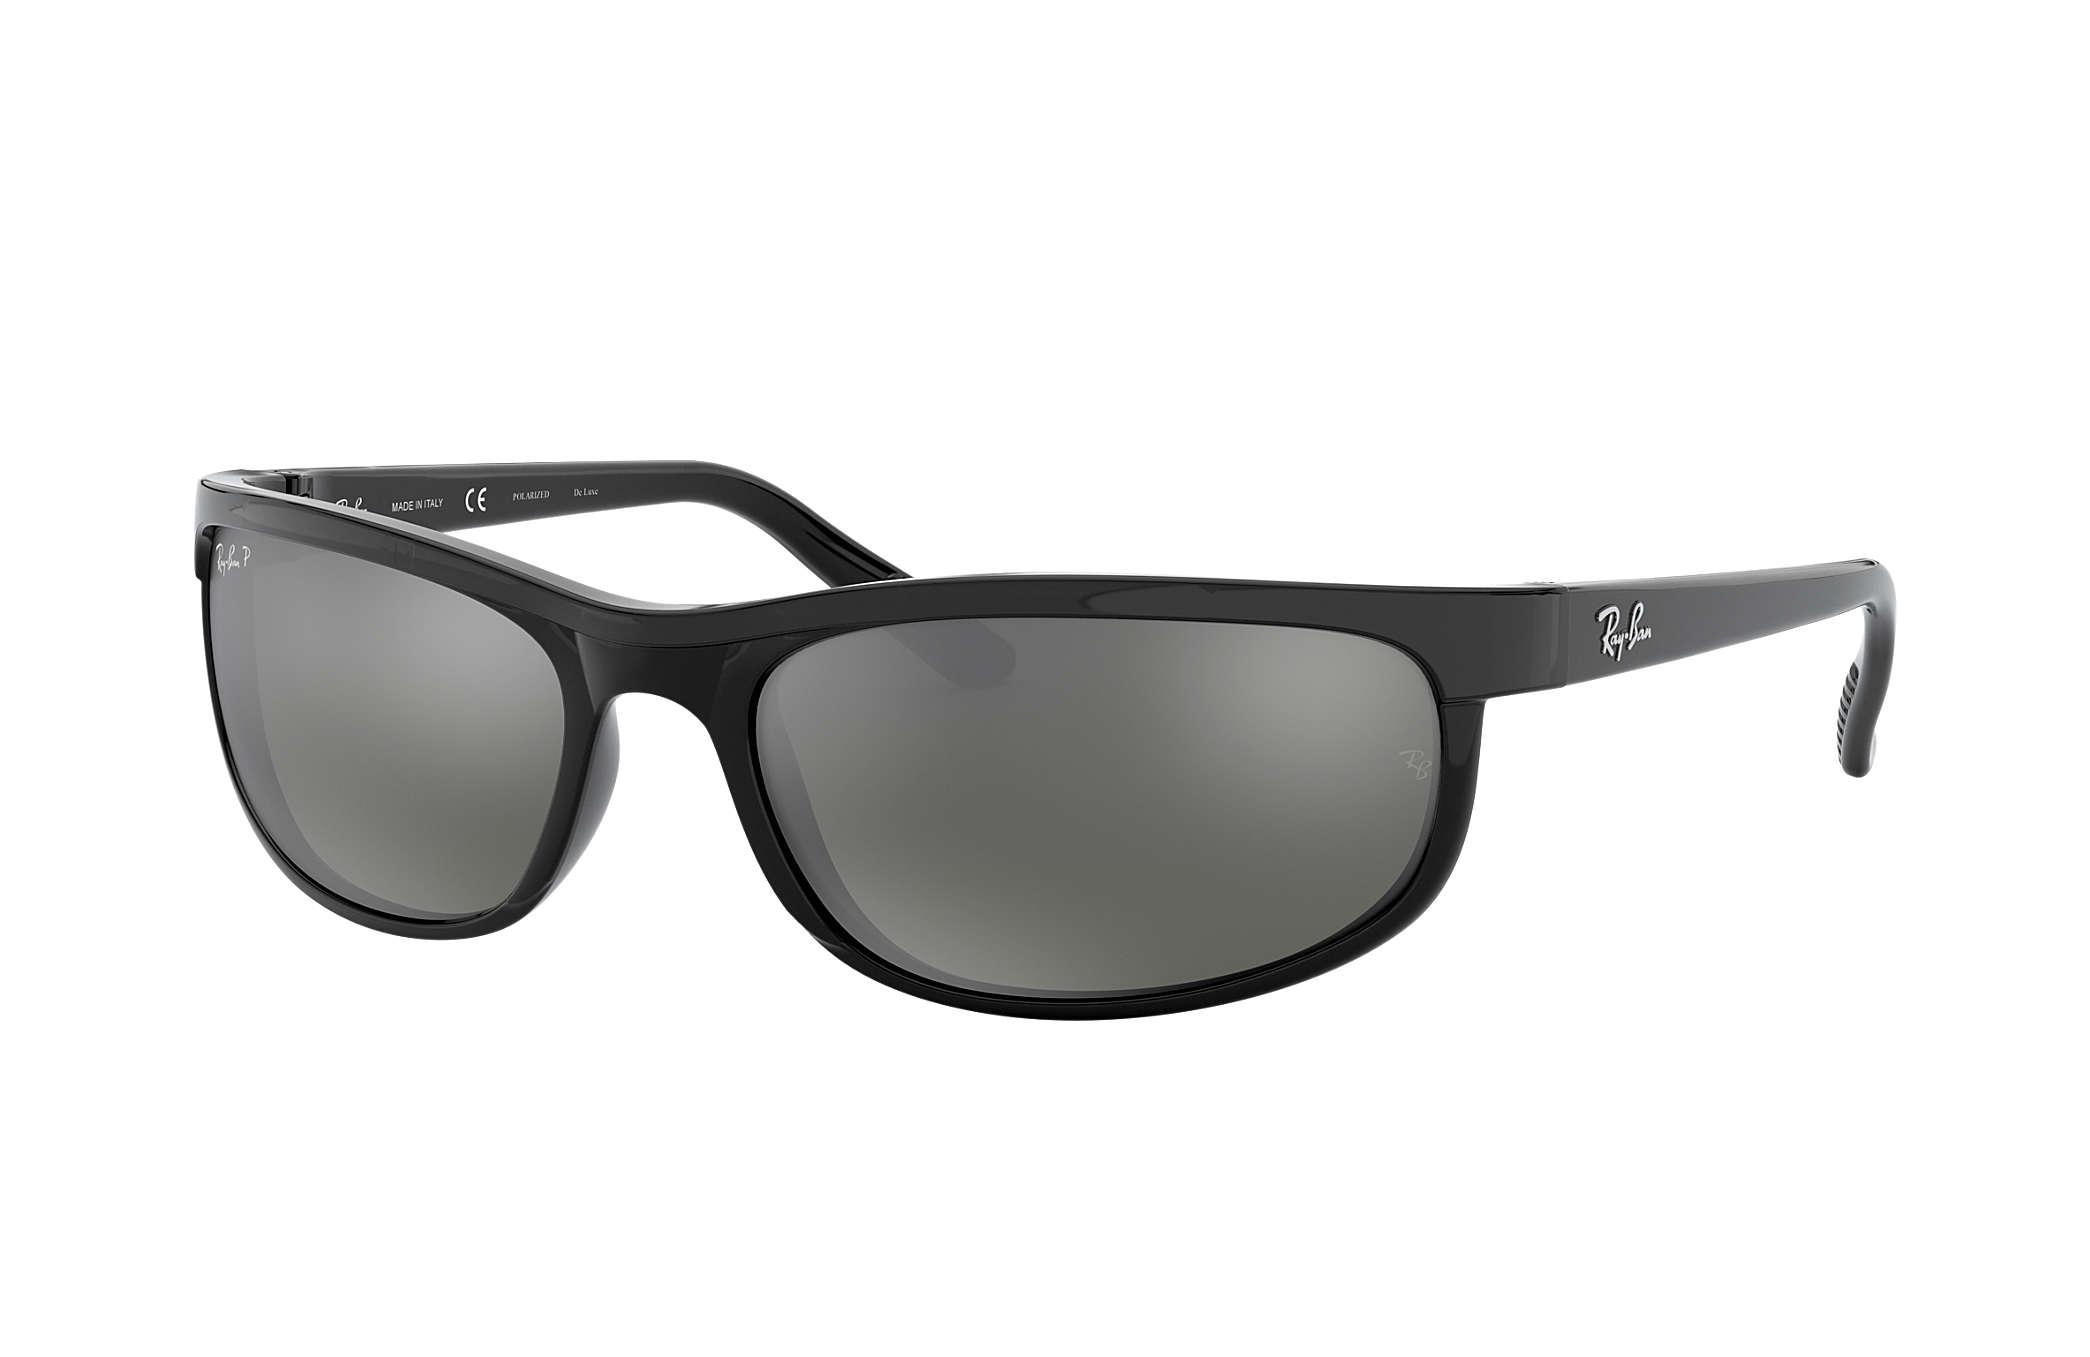 ray ban prix  Ray-Ban Predator 2 Black, Polarized Lenses - RB2027